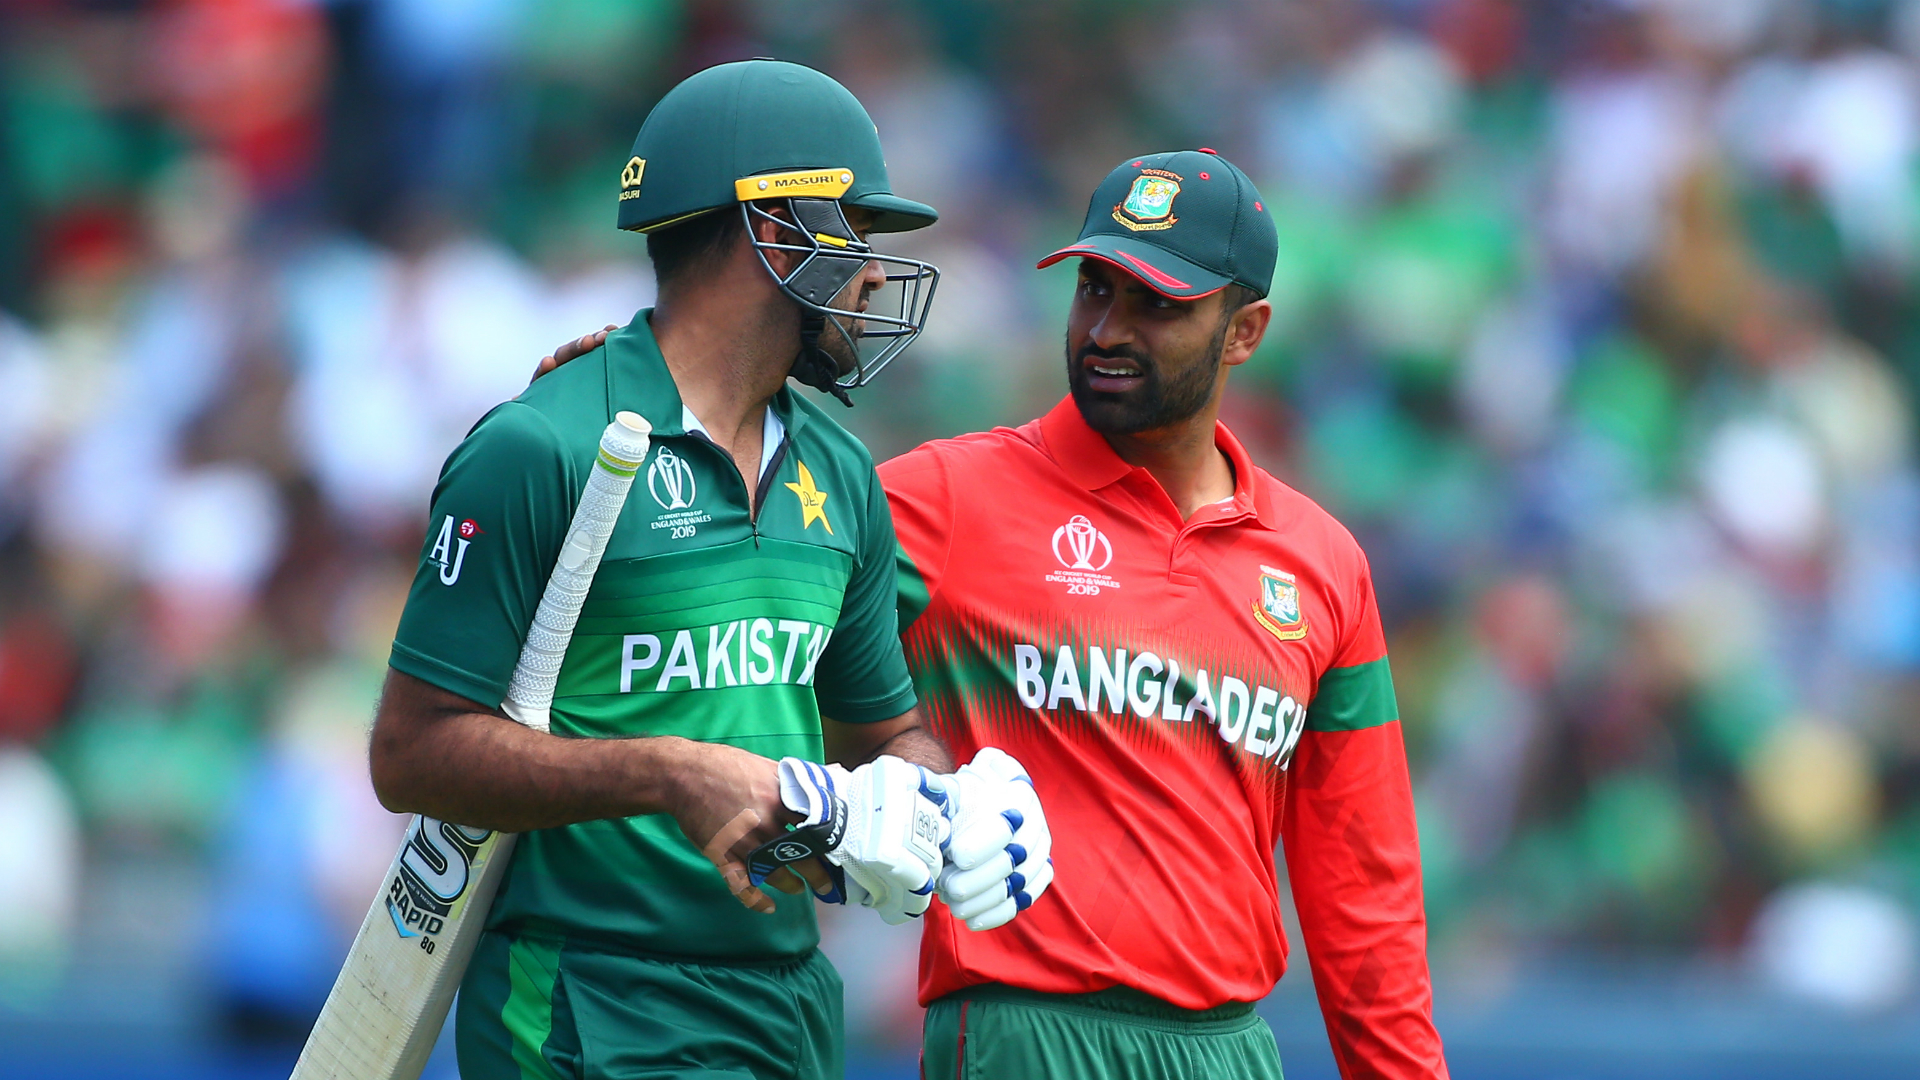 Coronavirus: Pakistan and Bangladesh postpone Test and ODI matches